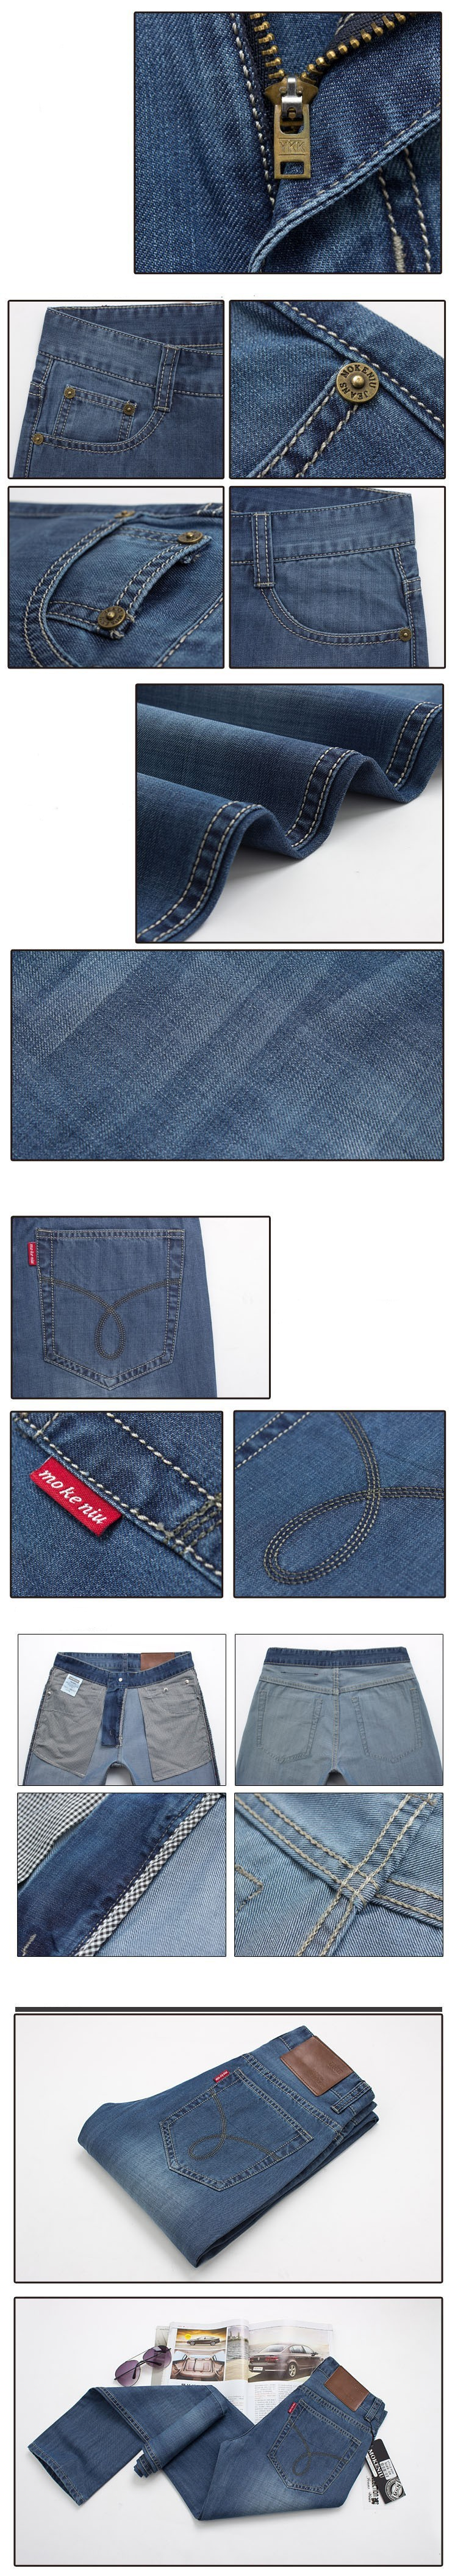 Мужские джинсы Fashion Men's Clothing Summer Thin Jeans For Men Long Pants Slim Light Blue Jean mens jeans